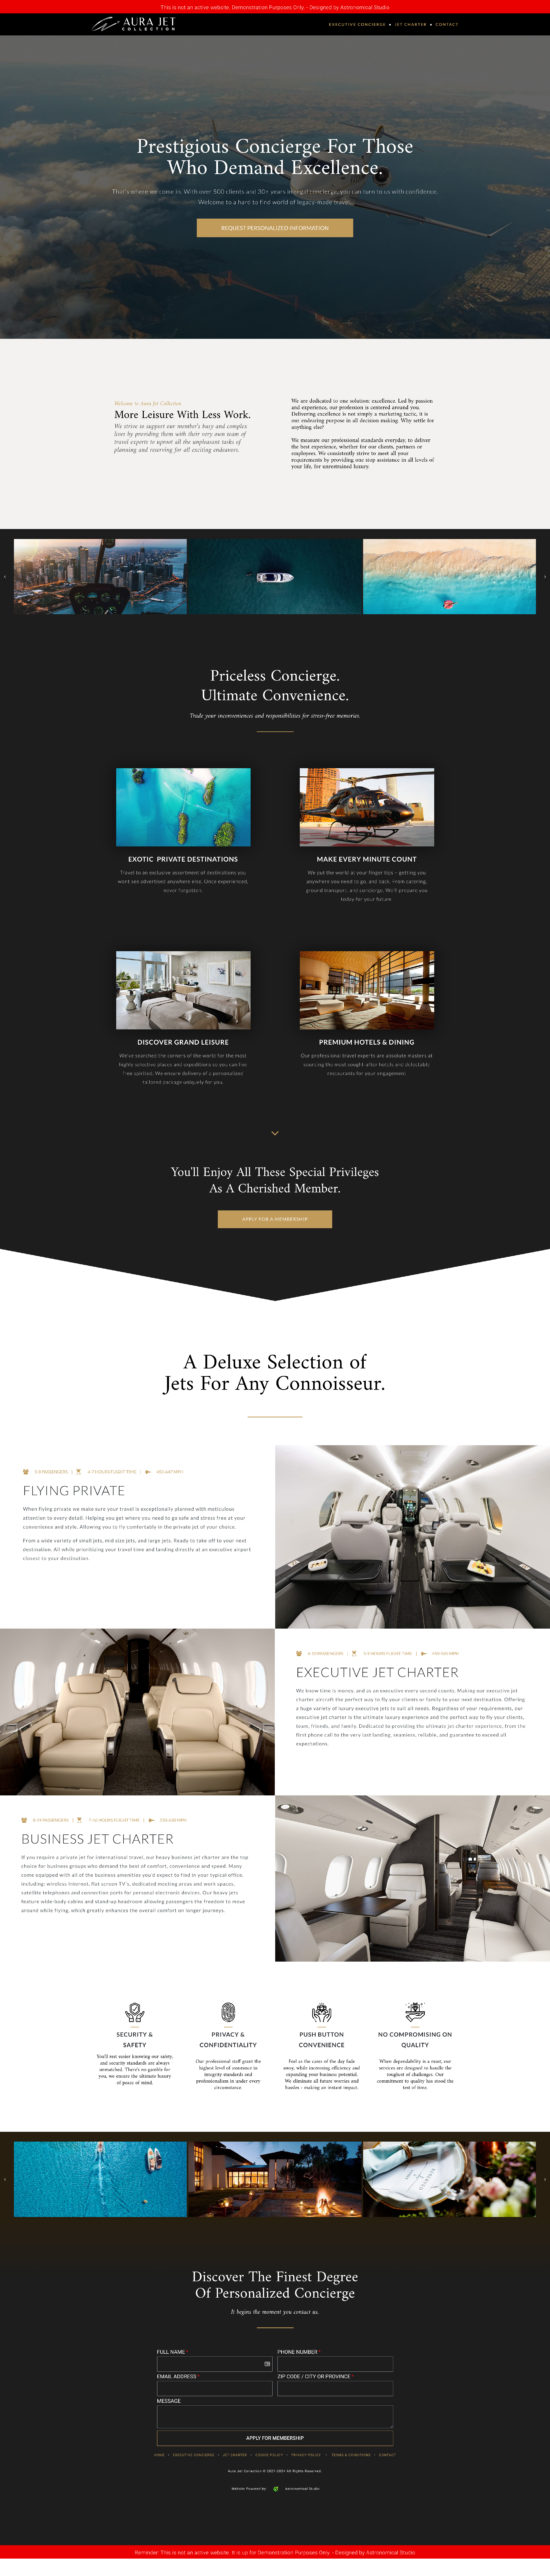 Aura-Jet-Collection-Website-Design-By-Astronomical-Studio